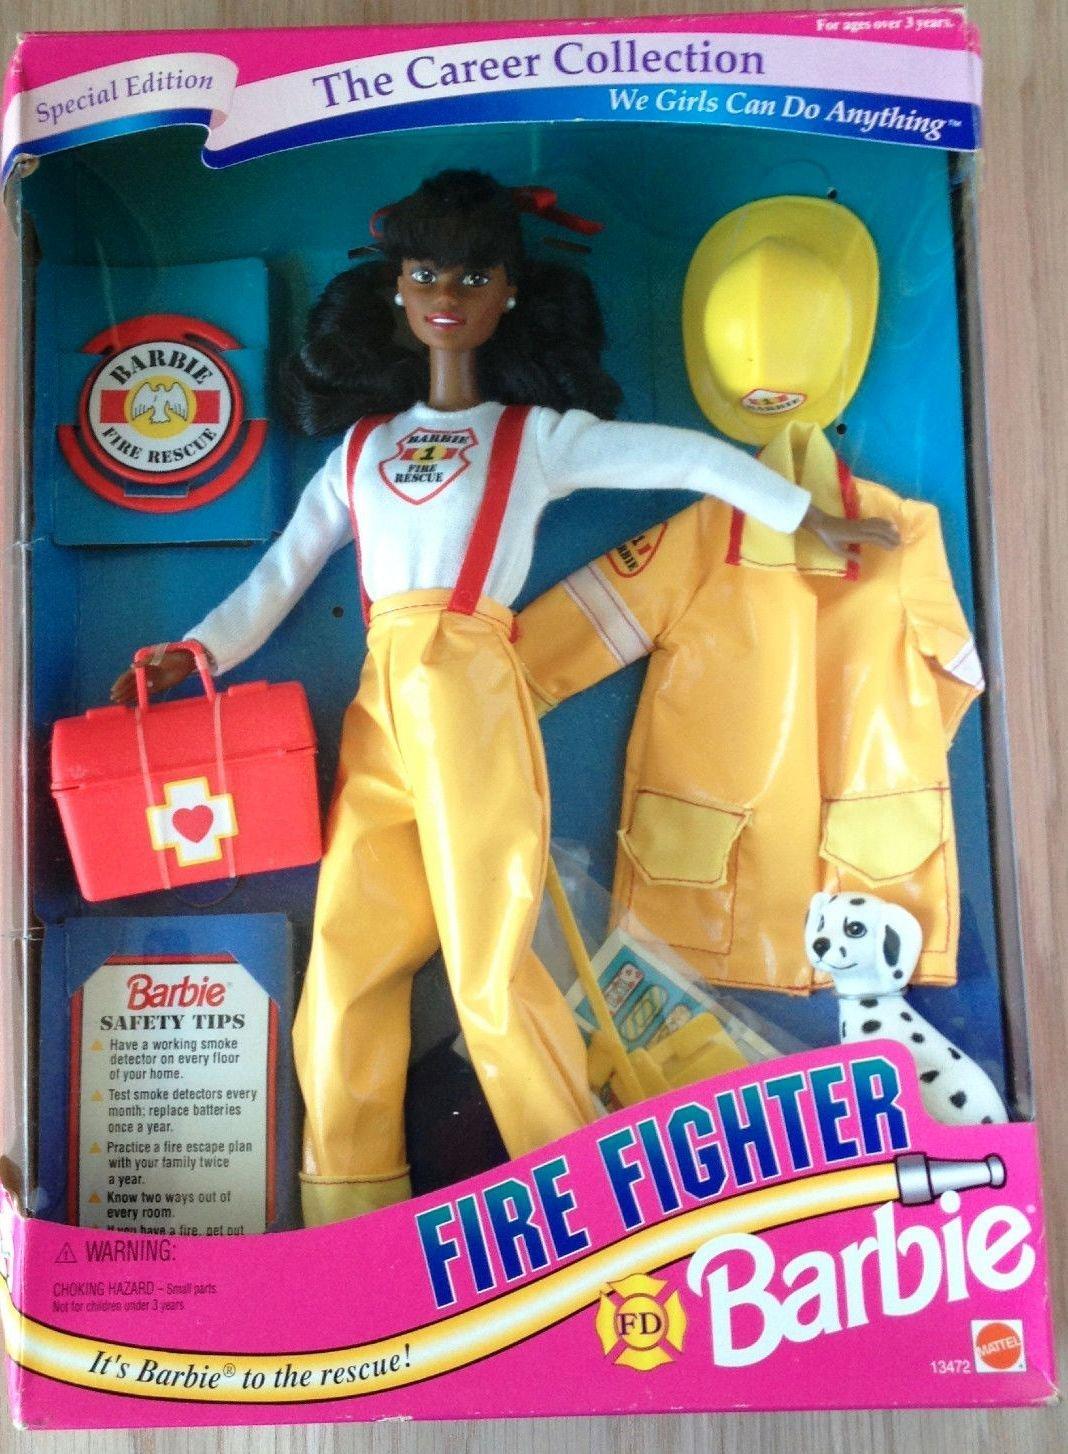 The Career Collection [並行輸入品] Fighter African American Fire Fighter Barbie The [並行輸入品] B077PB8KLB, 新茶静岡茶栽培農家 銀 平:2a00e458 --- arvoreazul.com.br